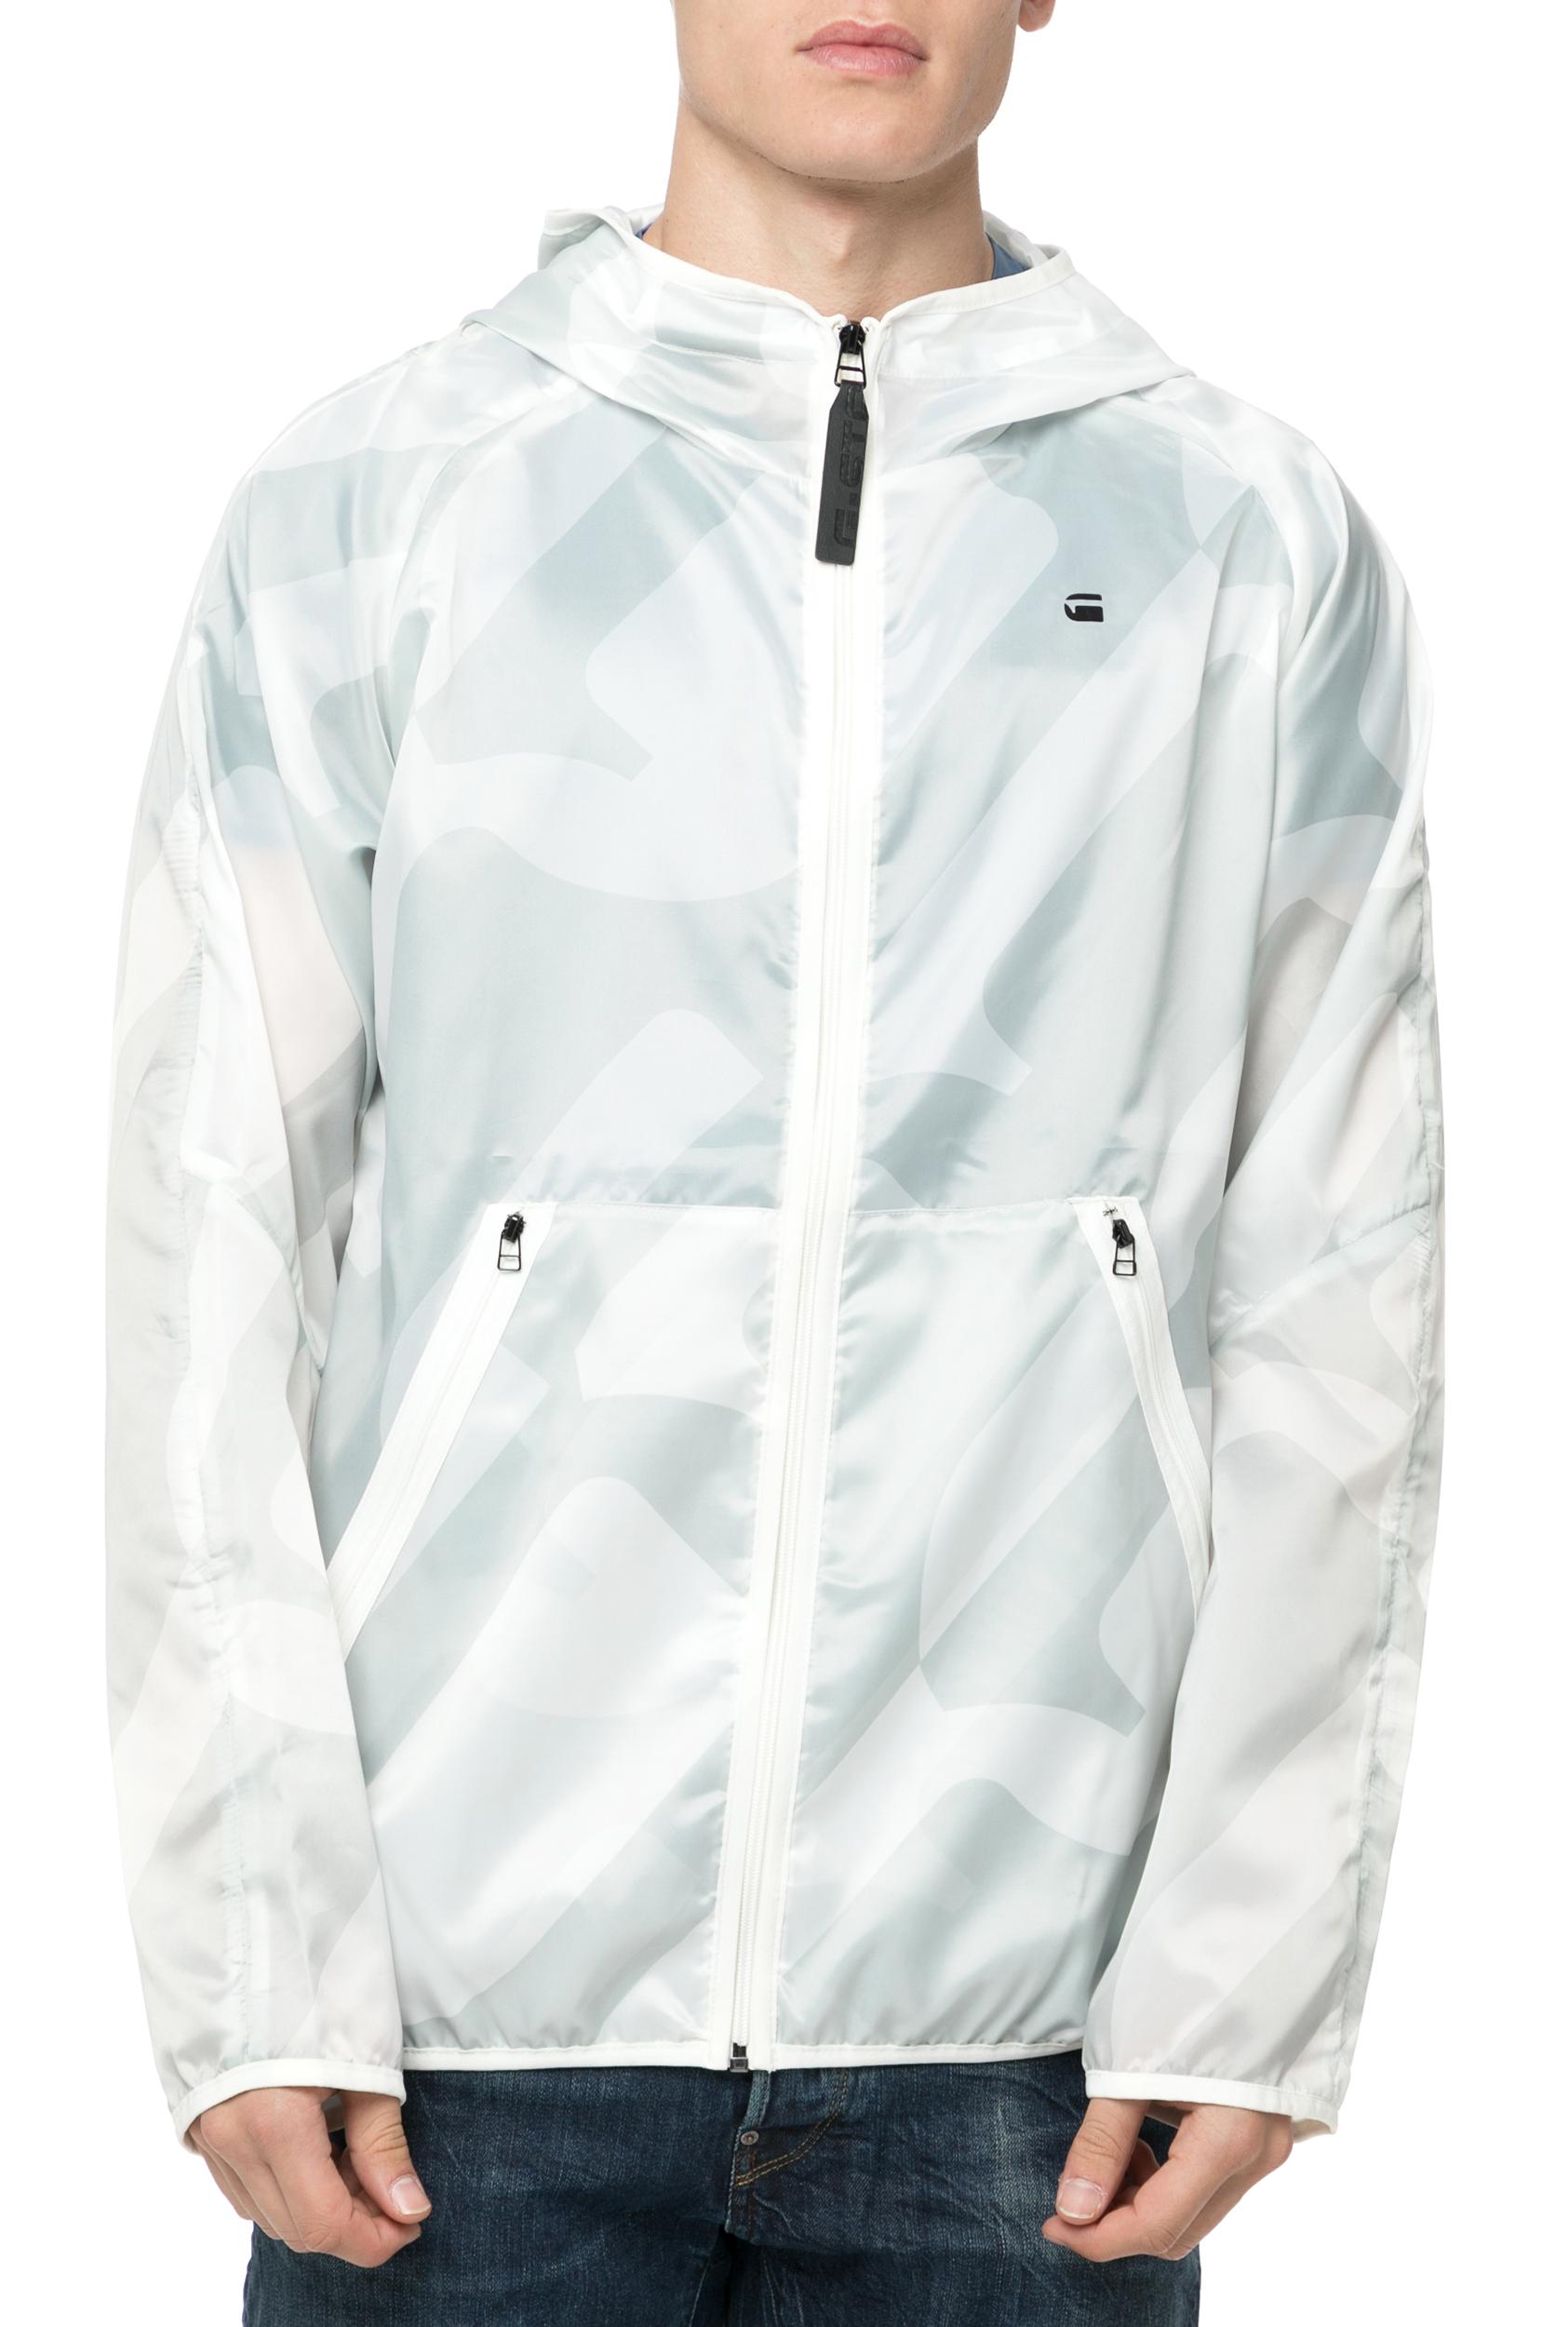 G-STAR RAW - Ανδρικό τζάκετ Strett Hooded Overshirt & Gymbag λευκό-γκρι